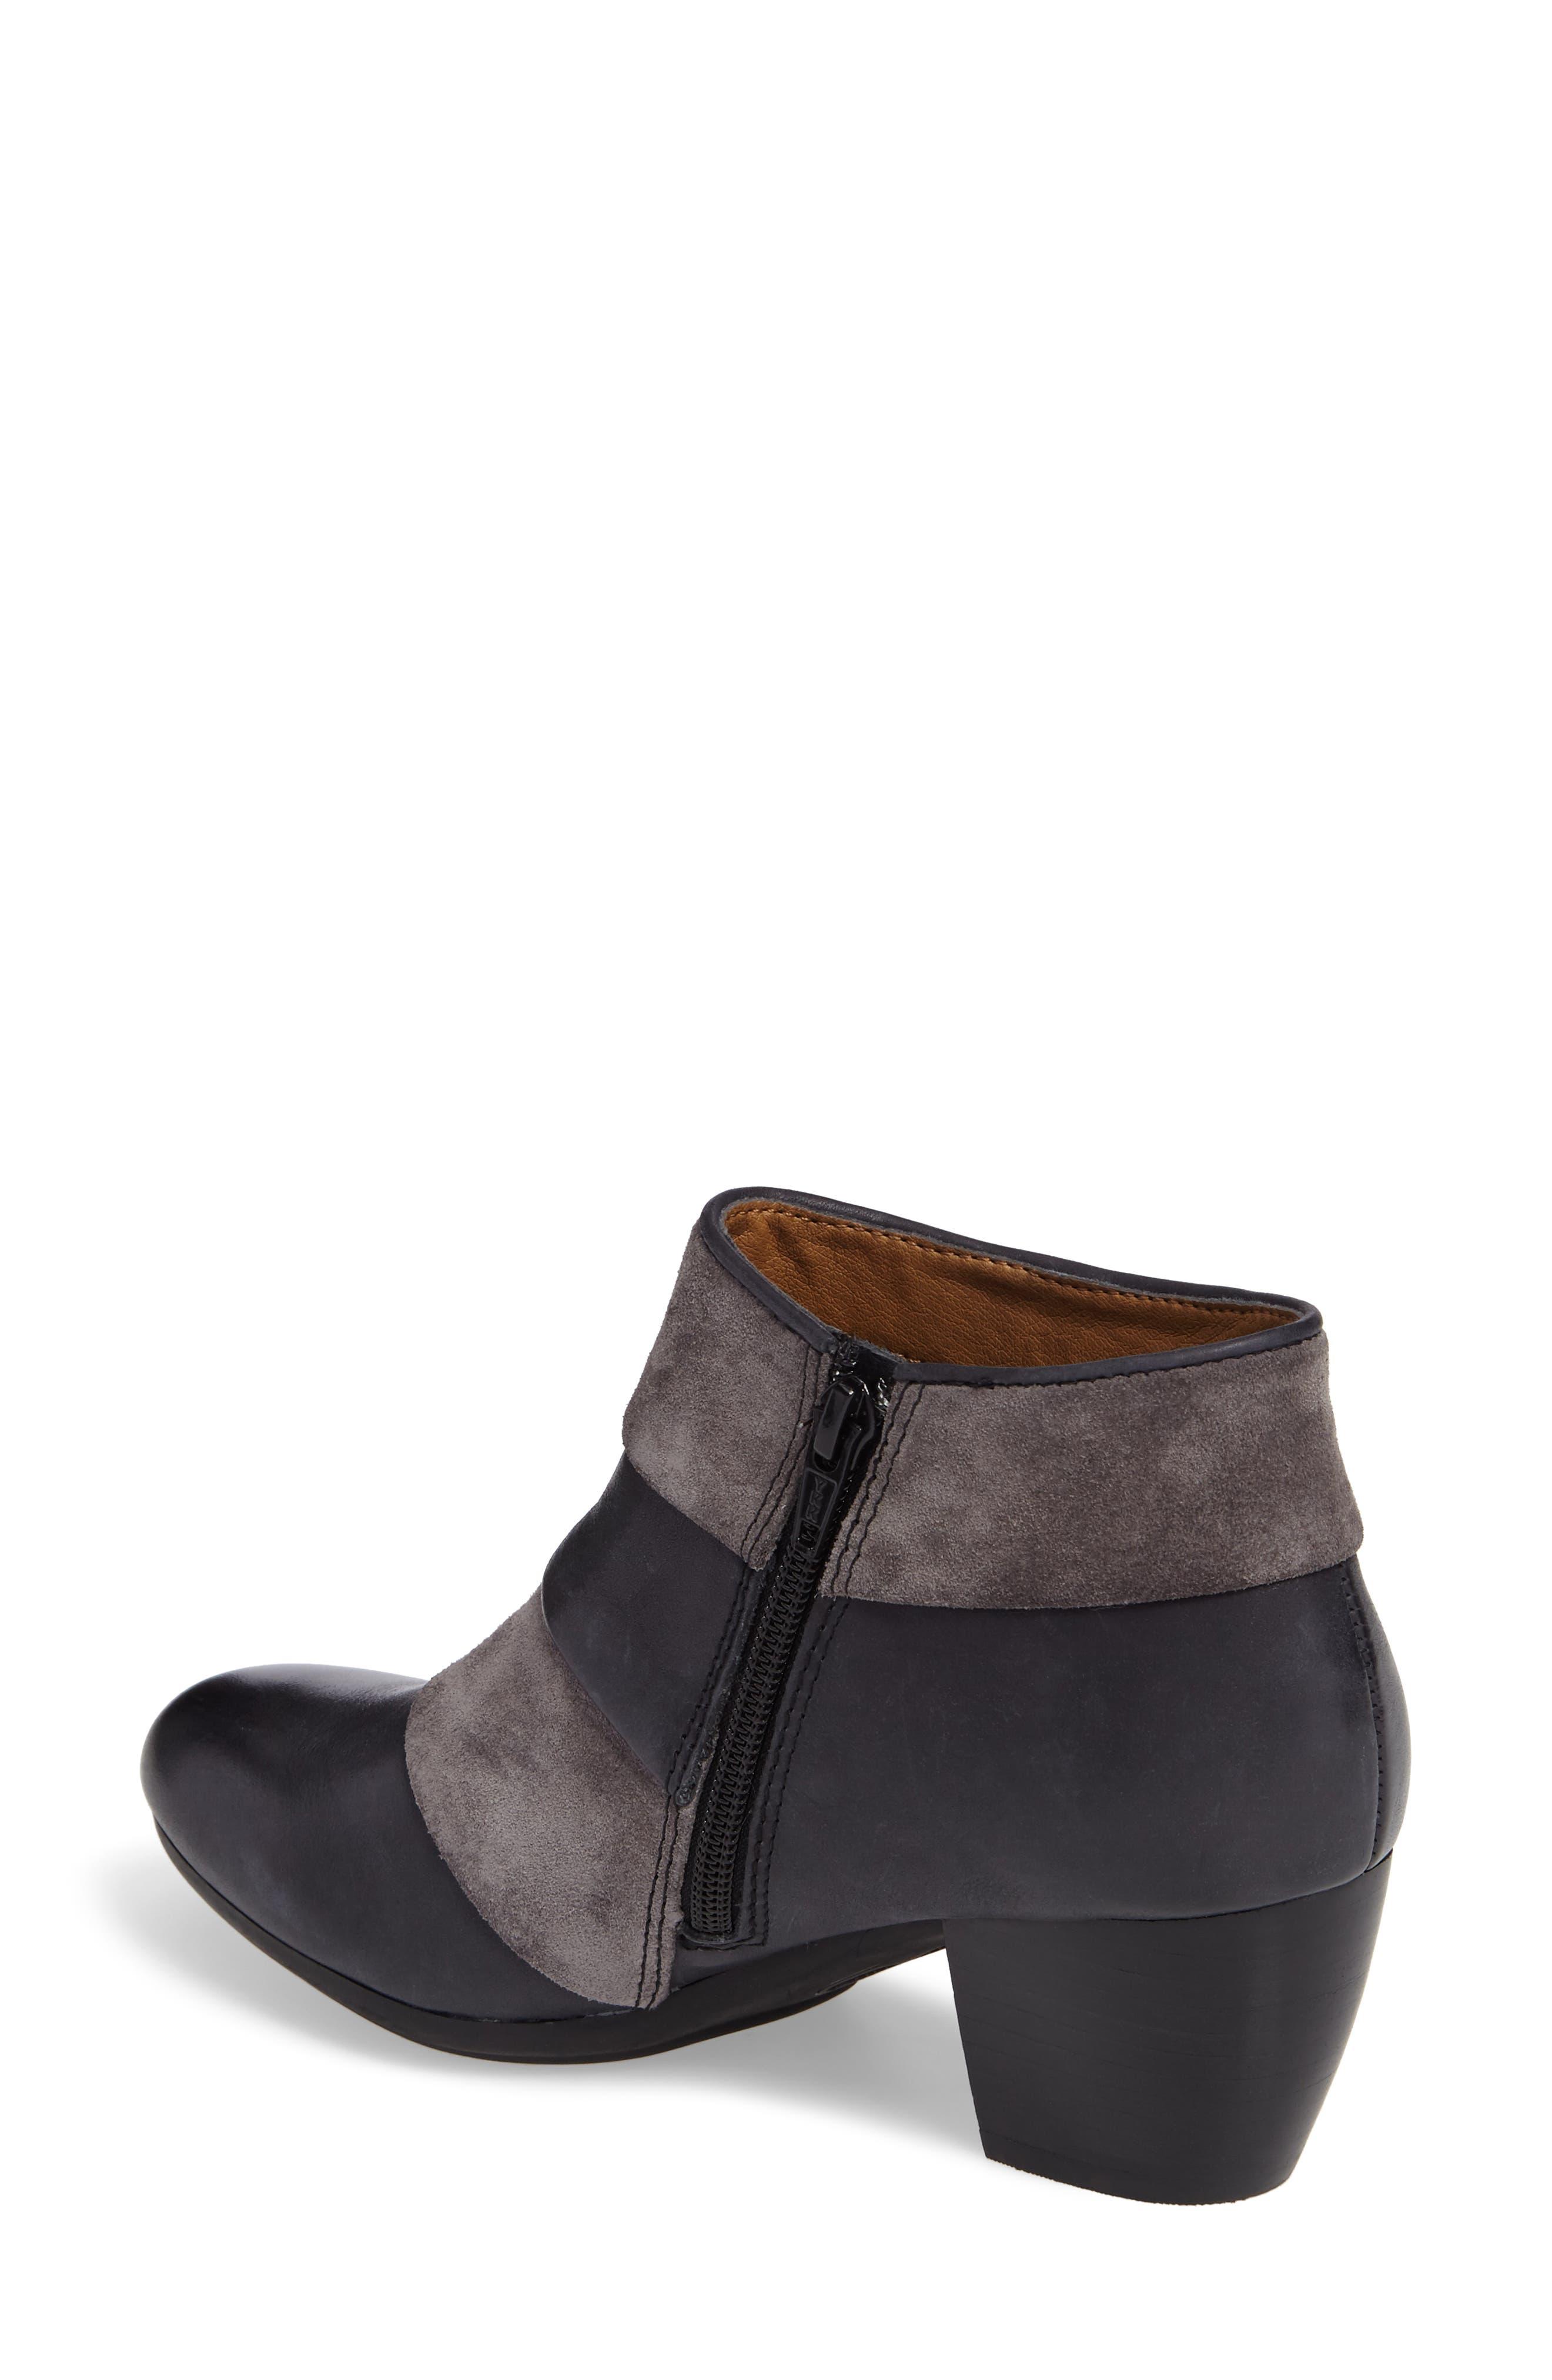 Amesbury Colorblock Bootie,                             Alternate thumbnail 2, color,                             Black/ Steel Grey Leather